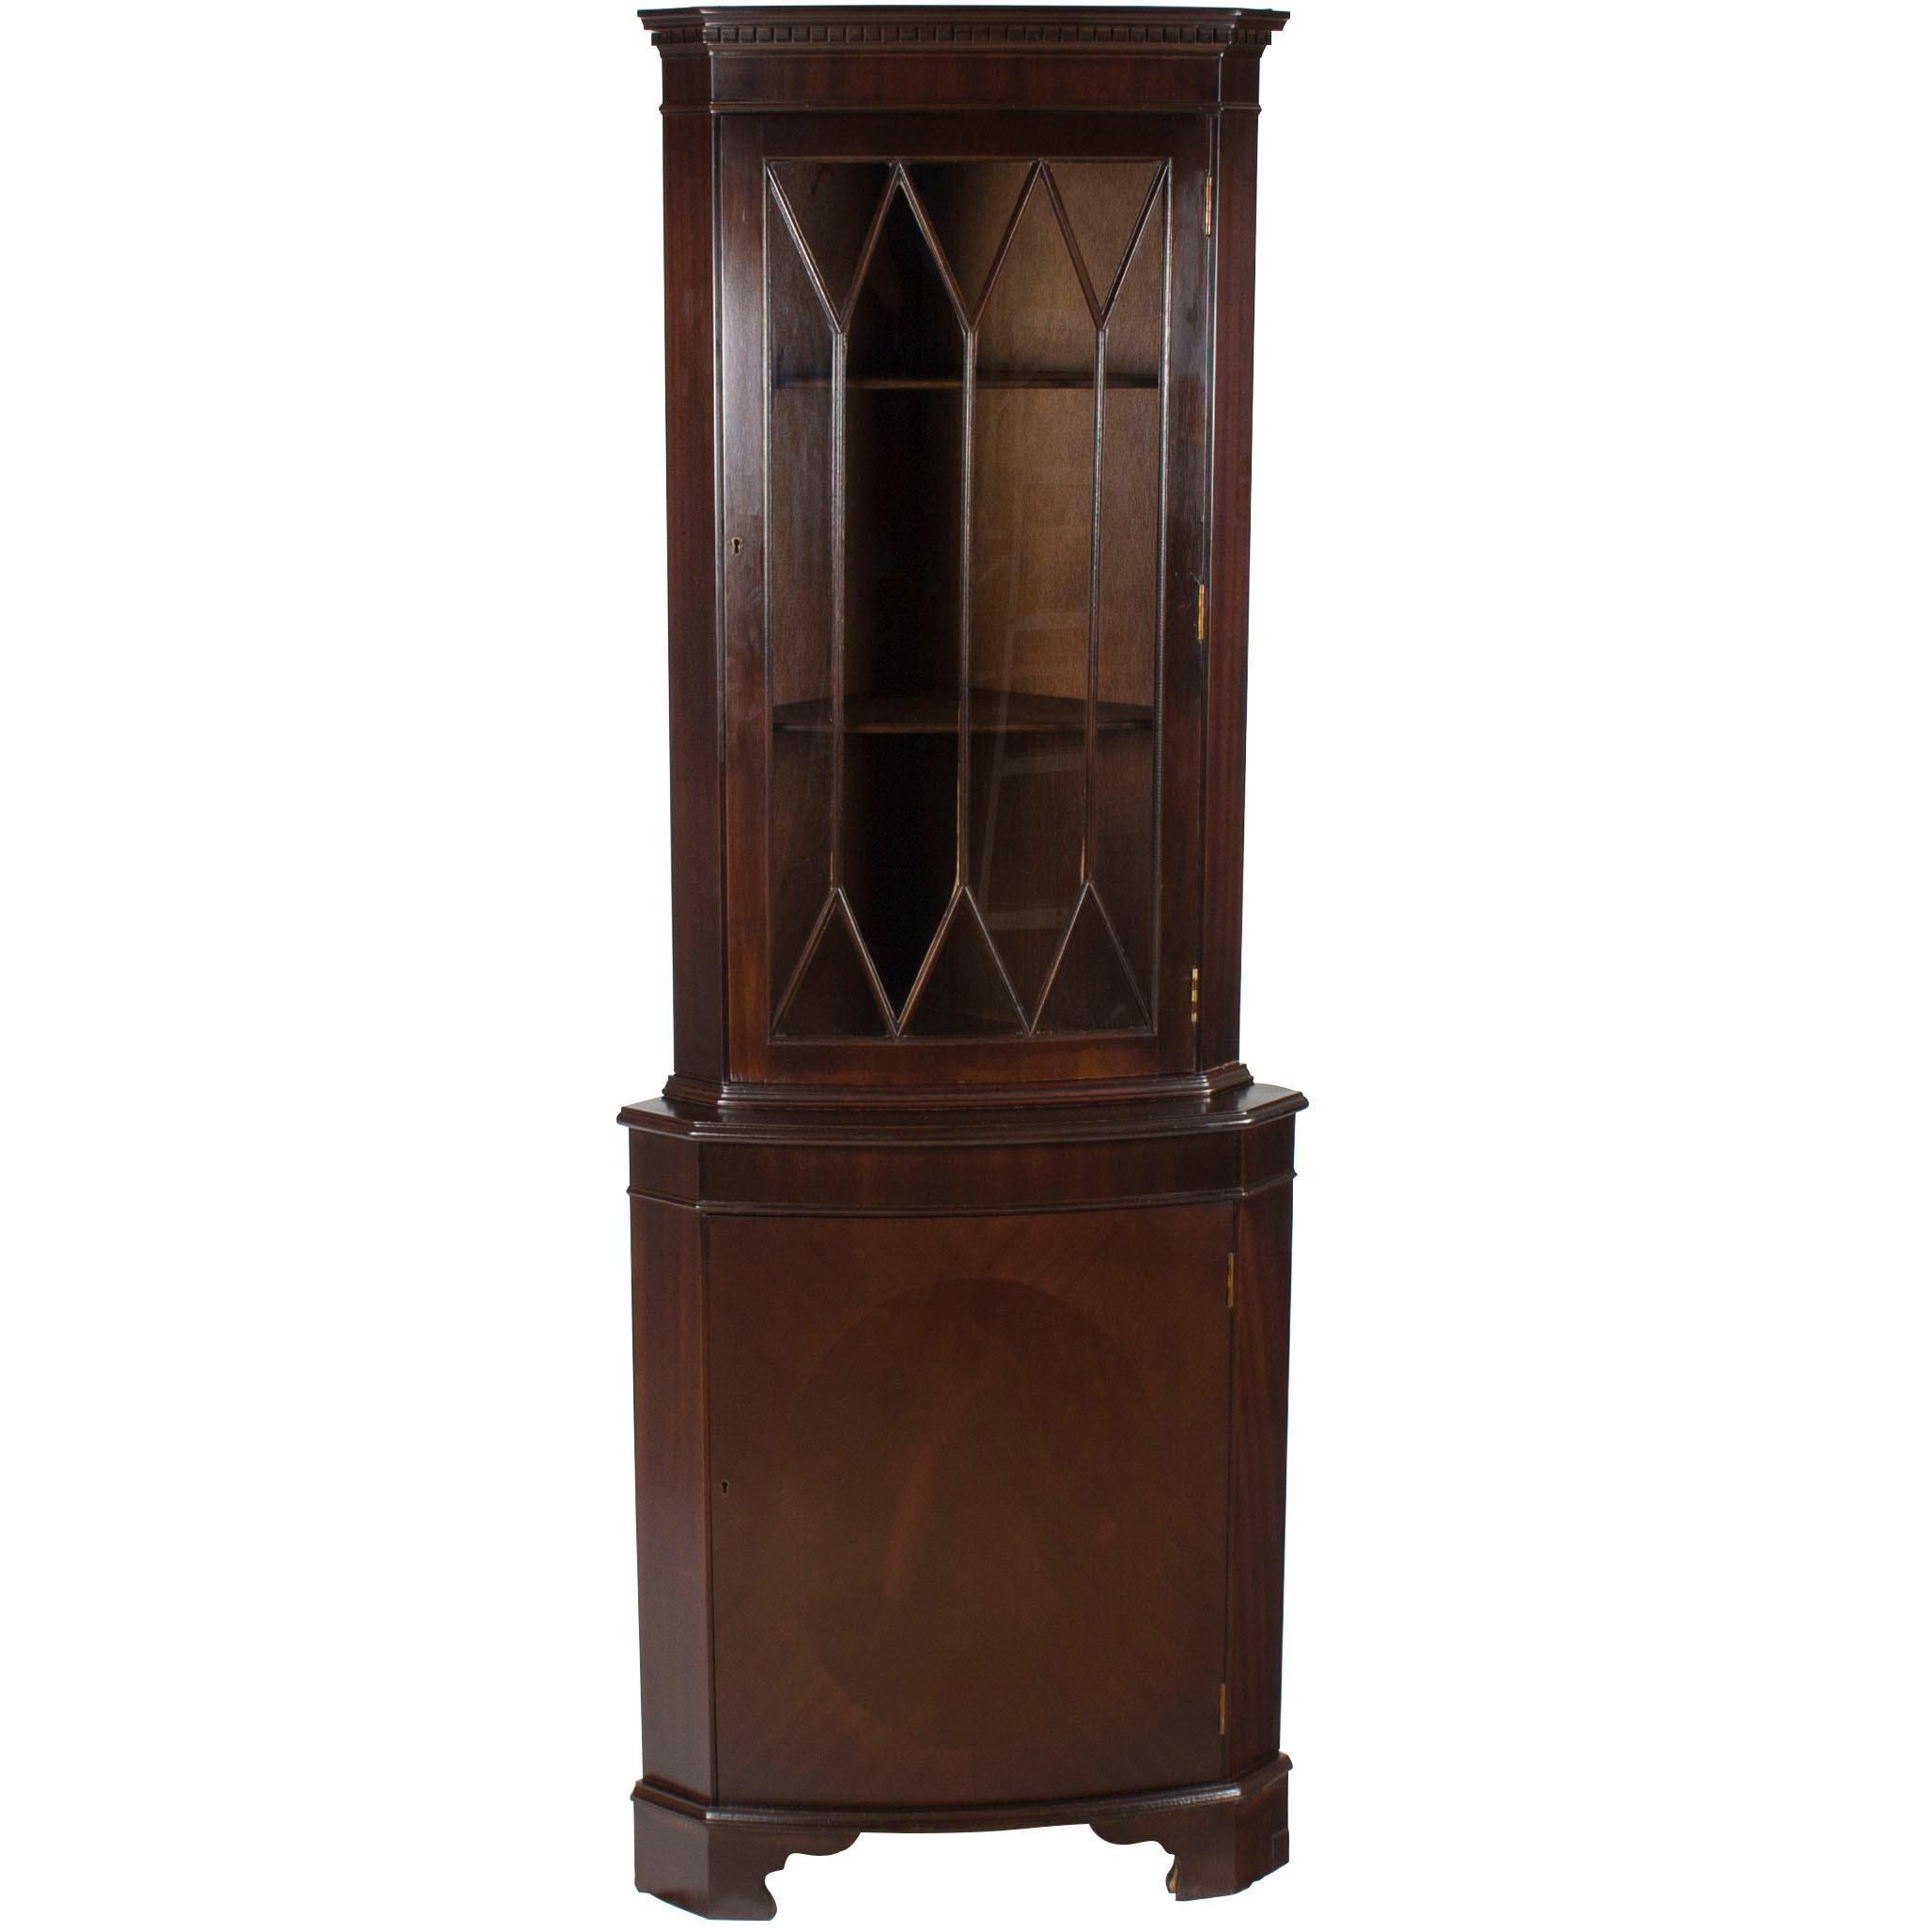 Attirant Tall Narrow Mahogany Single Door Corner Cabinet Cupboard